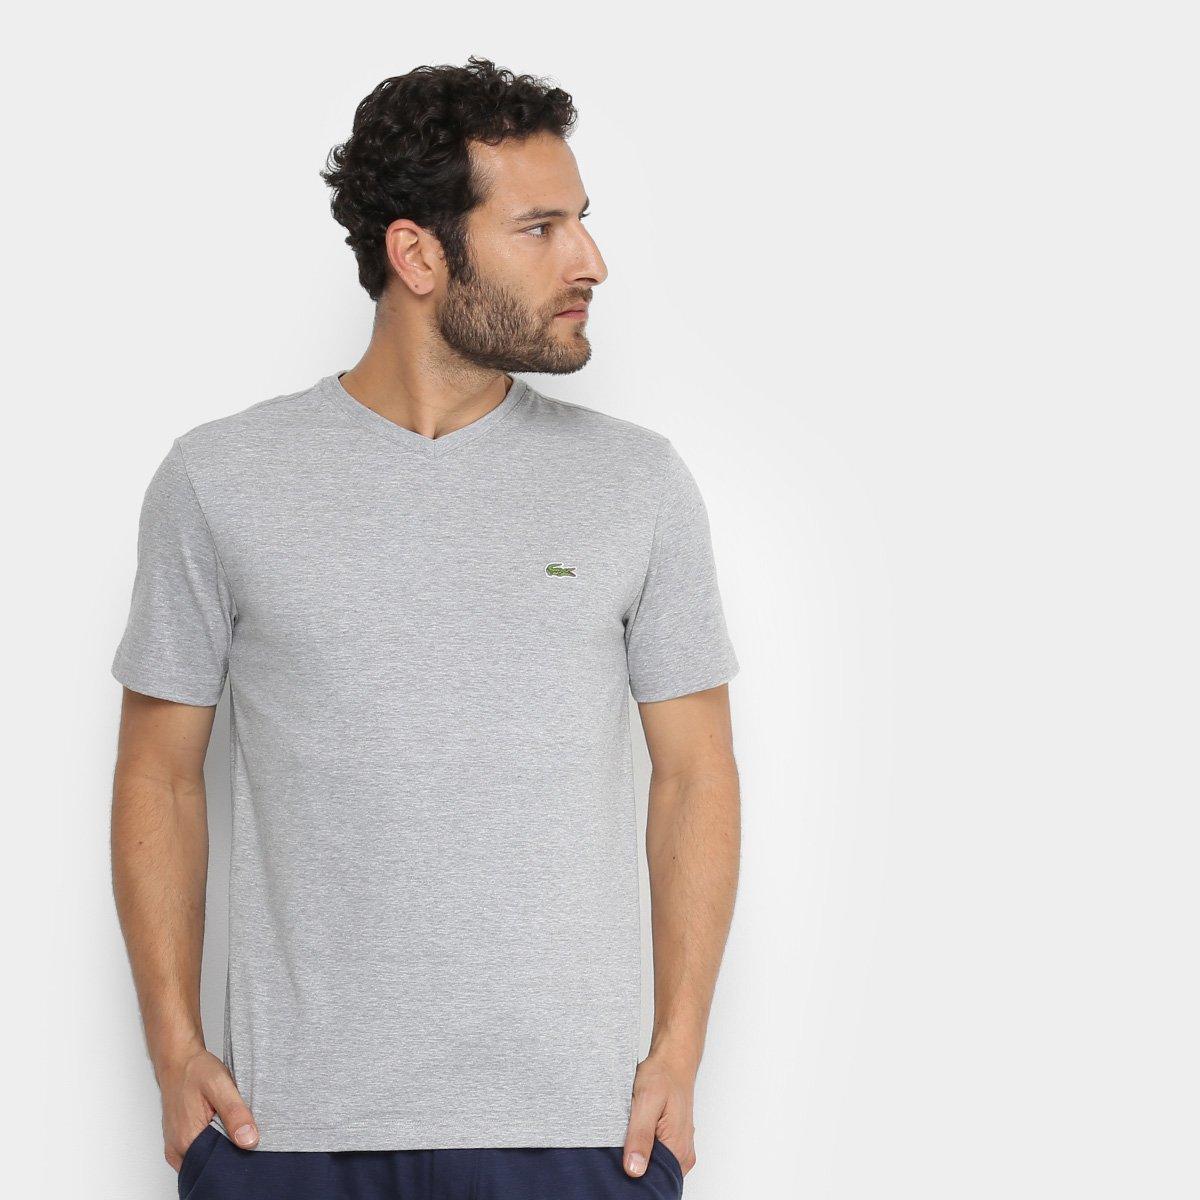 b56ff5f166a75 Camiseta Lacoste Gola V Masculina - Cinza - Compre Agora